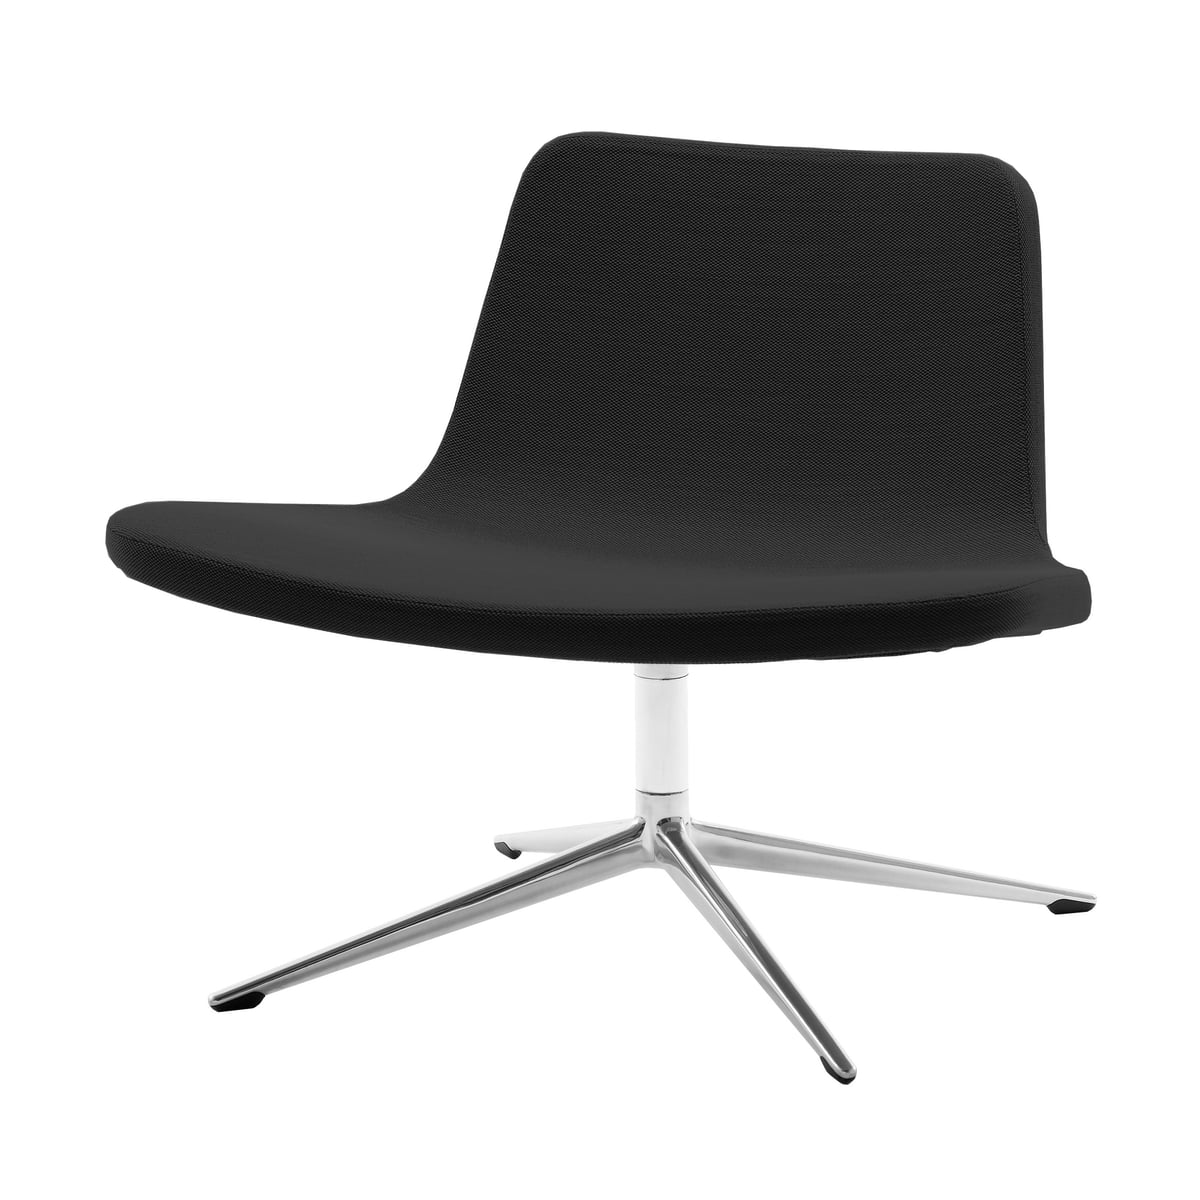 ray lounge chair bogie hay shop. Black Bedroom Furniture Sets. Home Design Ideas